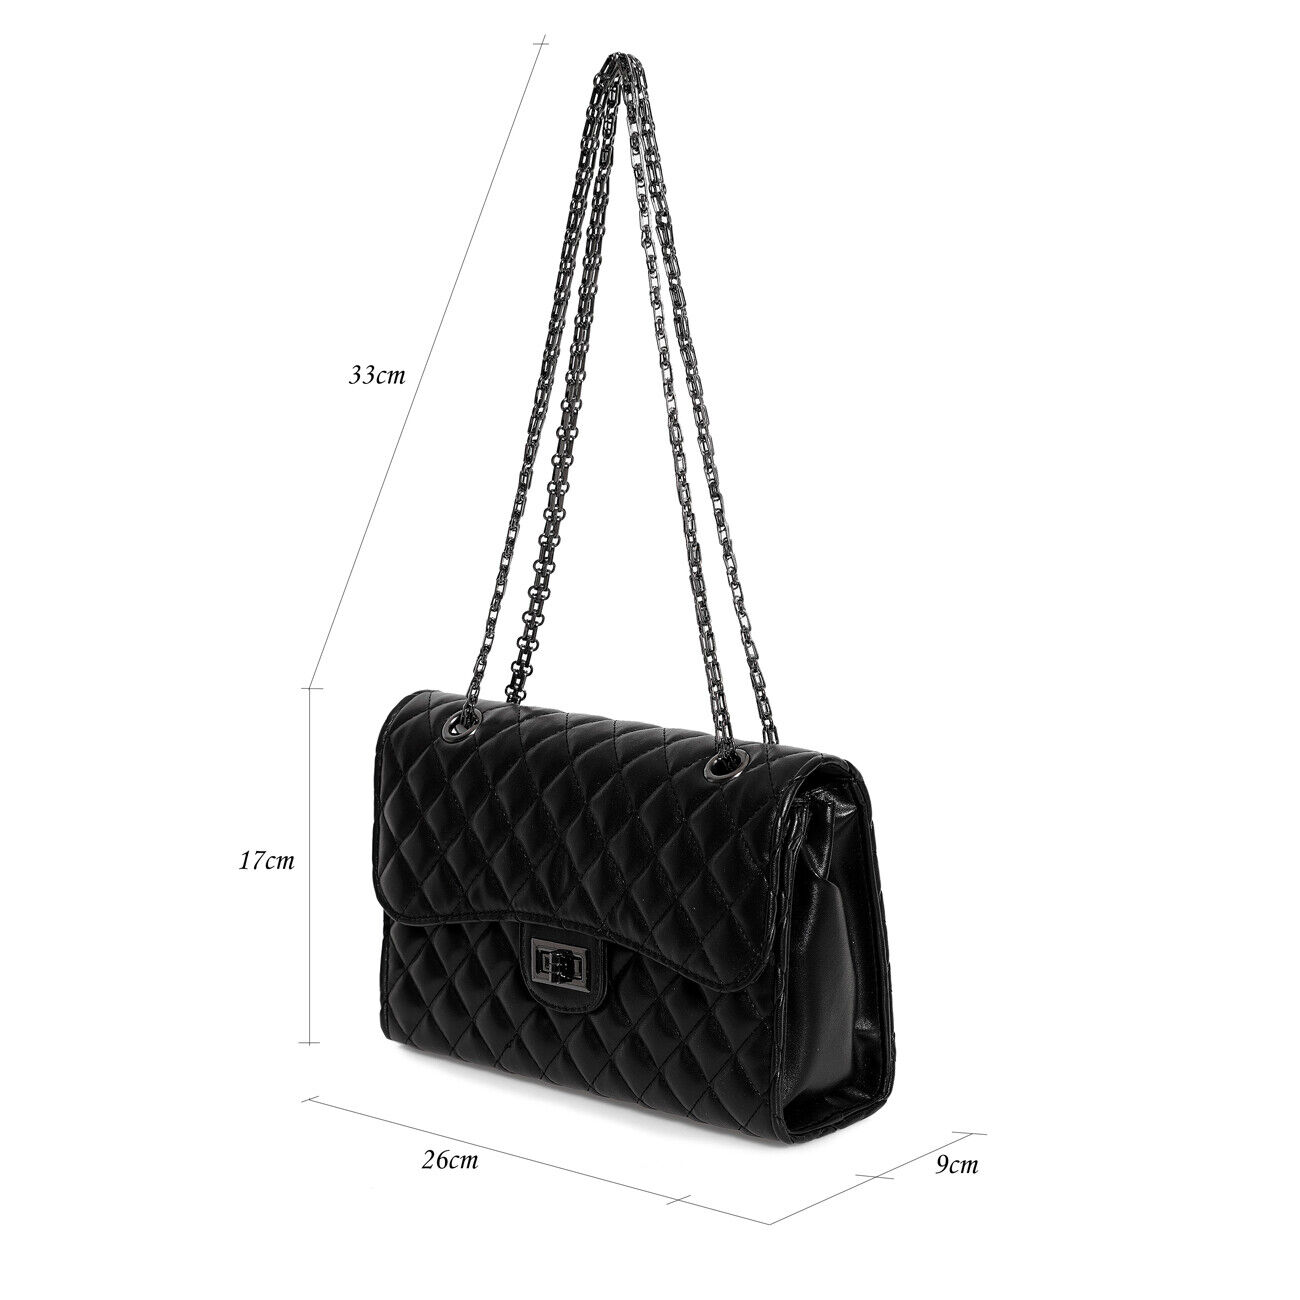 Damen Elegant Abendtasche Handtasche Gesteppt  ClutchTasche  Umhängetasche 02081